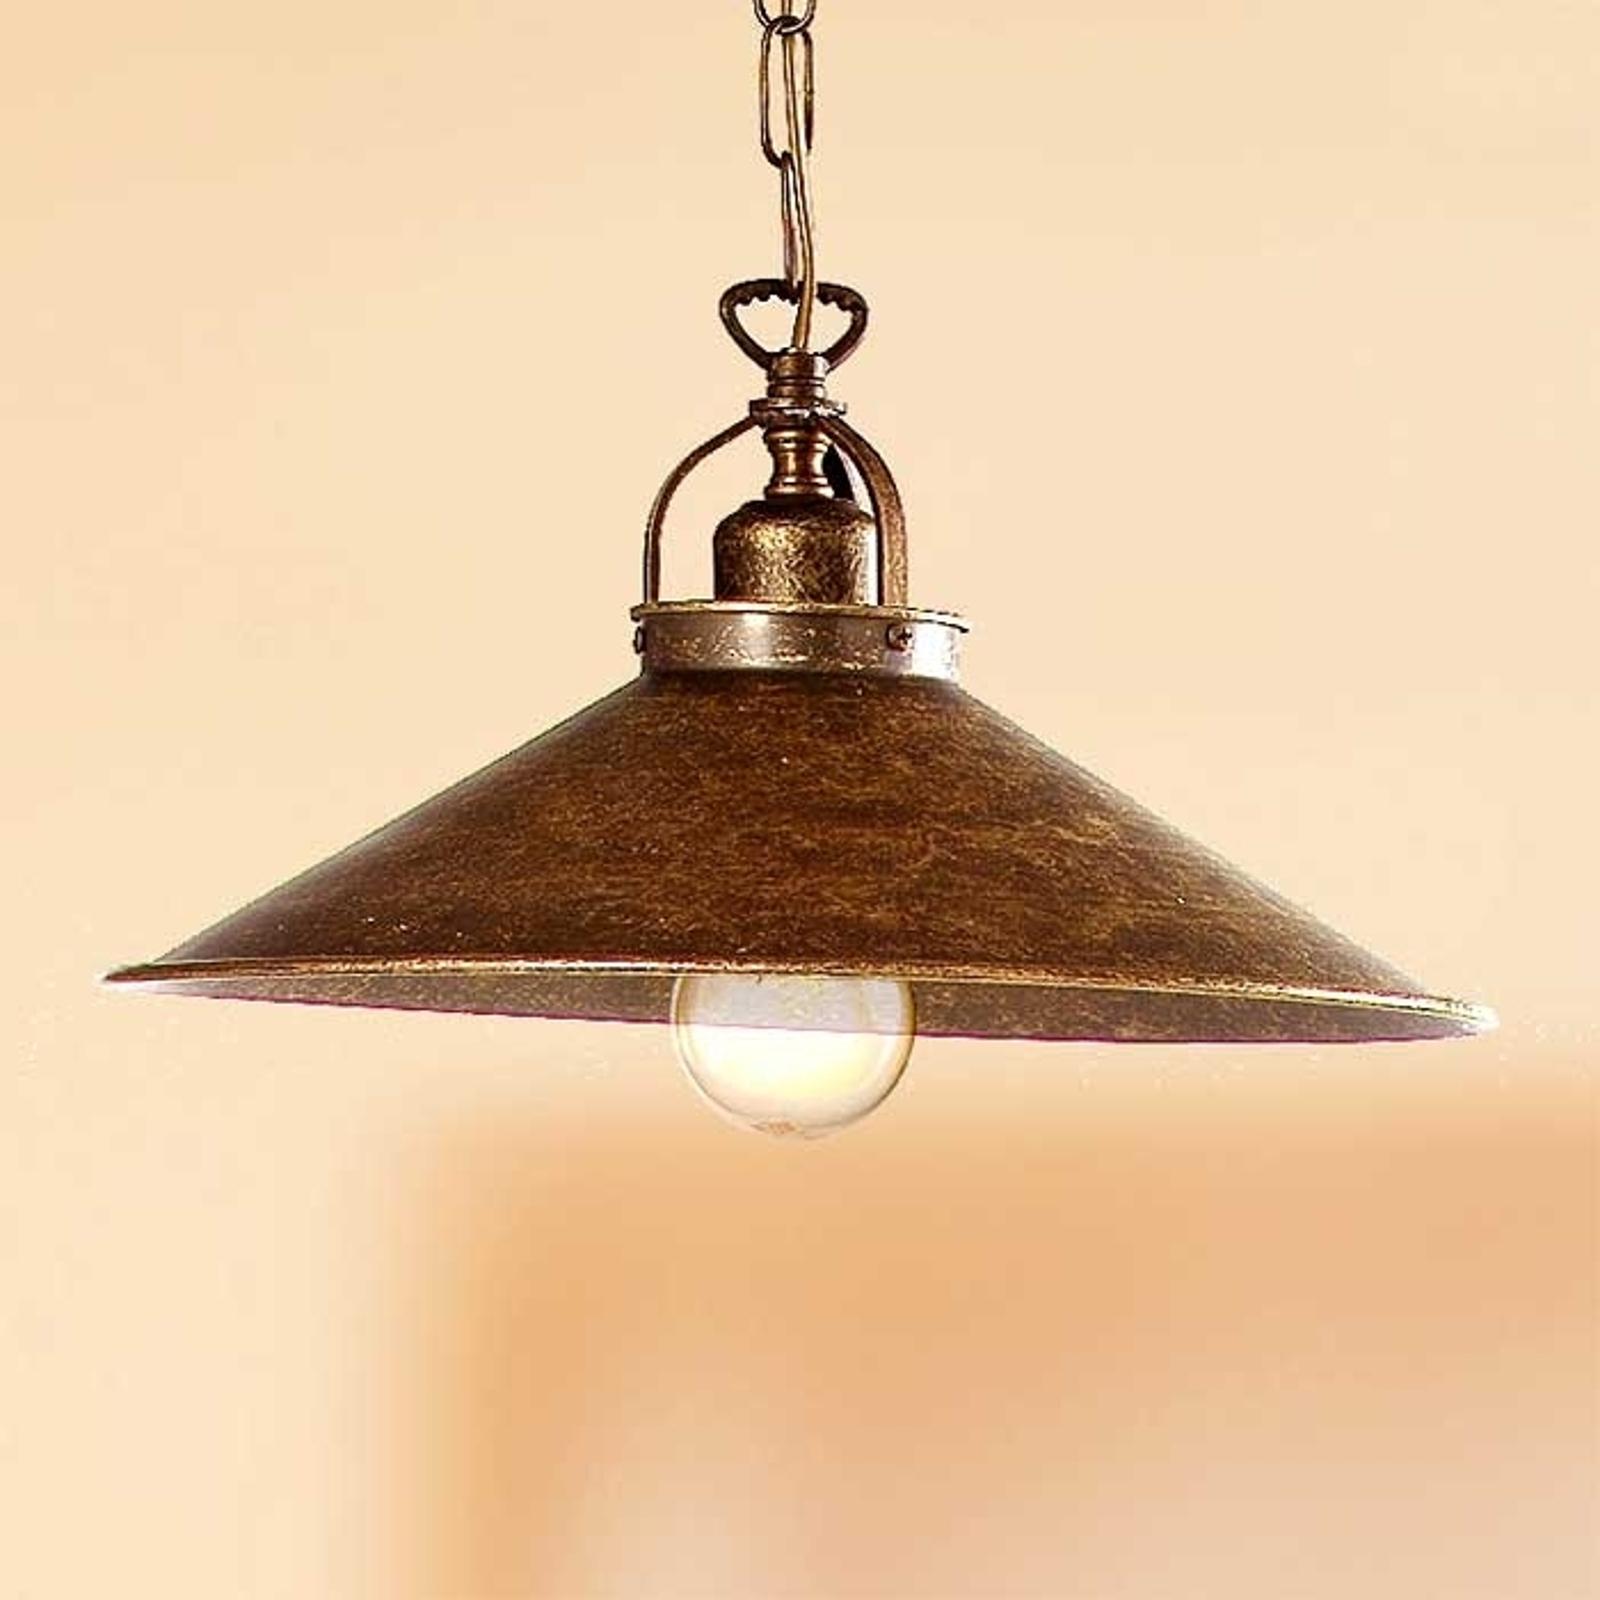 Rustieke hanglamp BRUNO, 35 cm